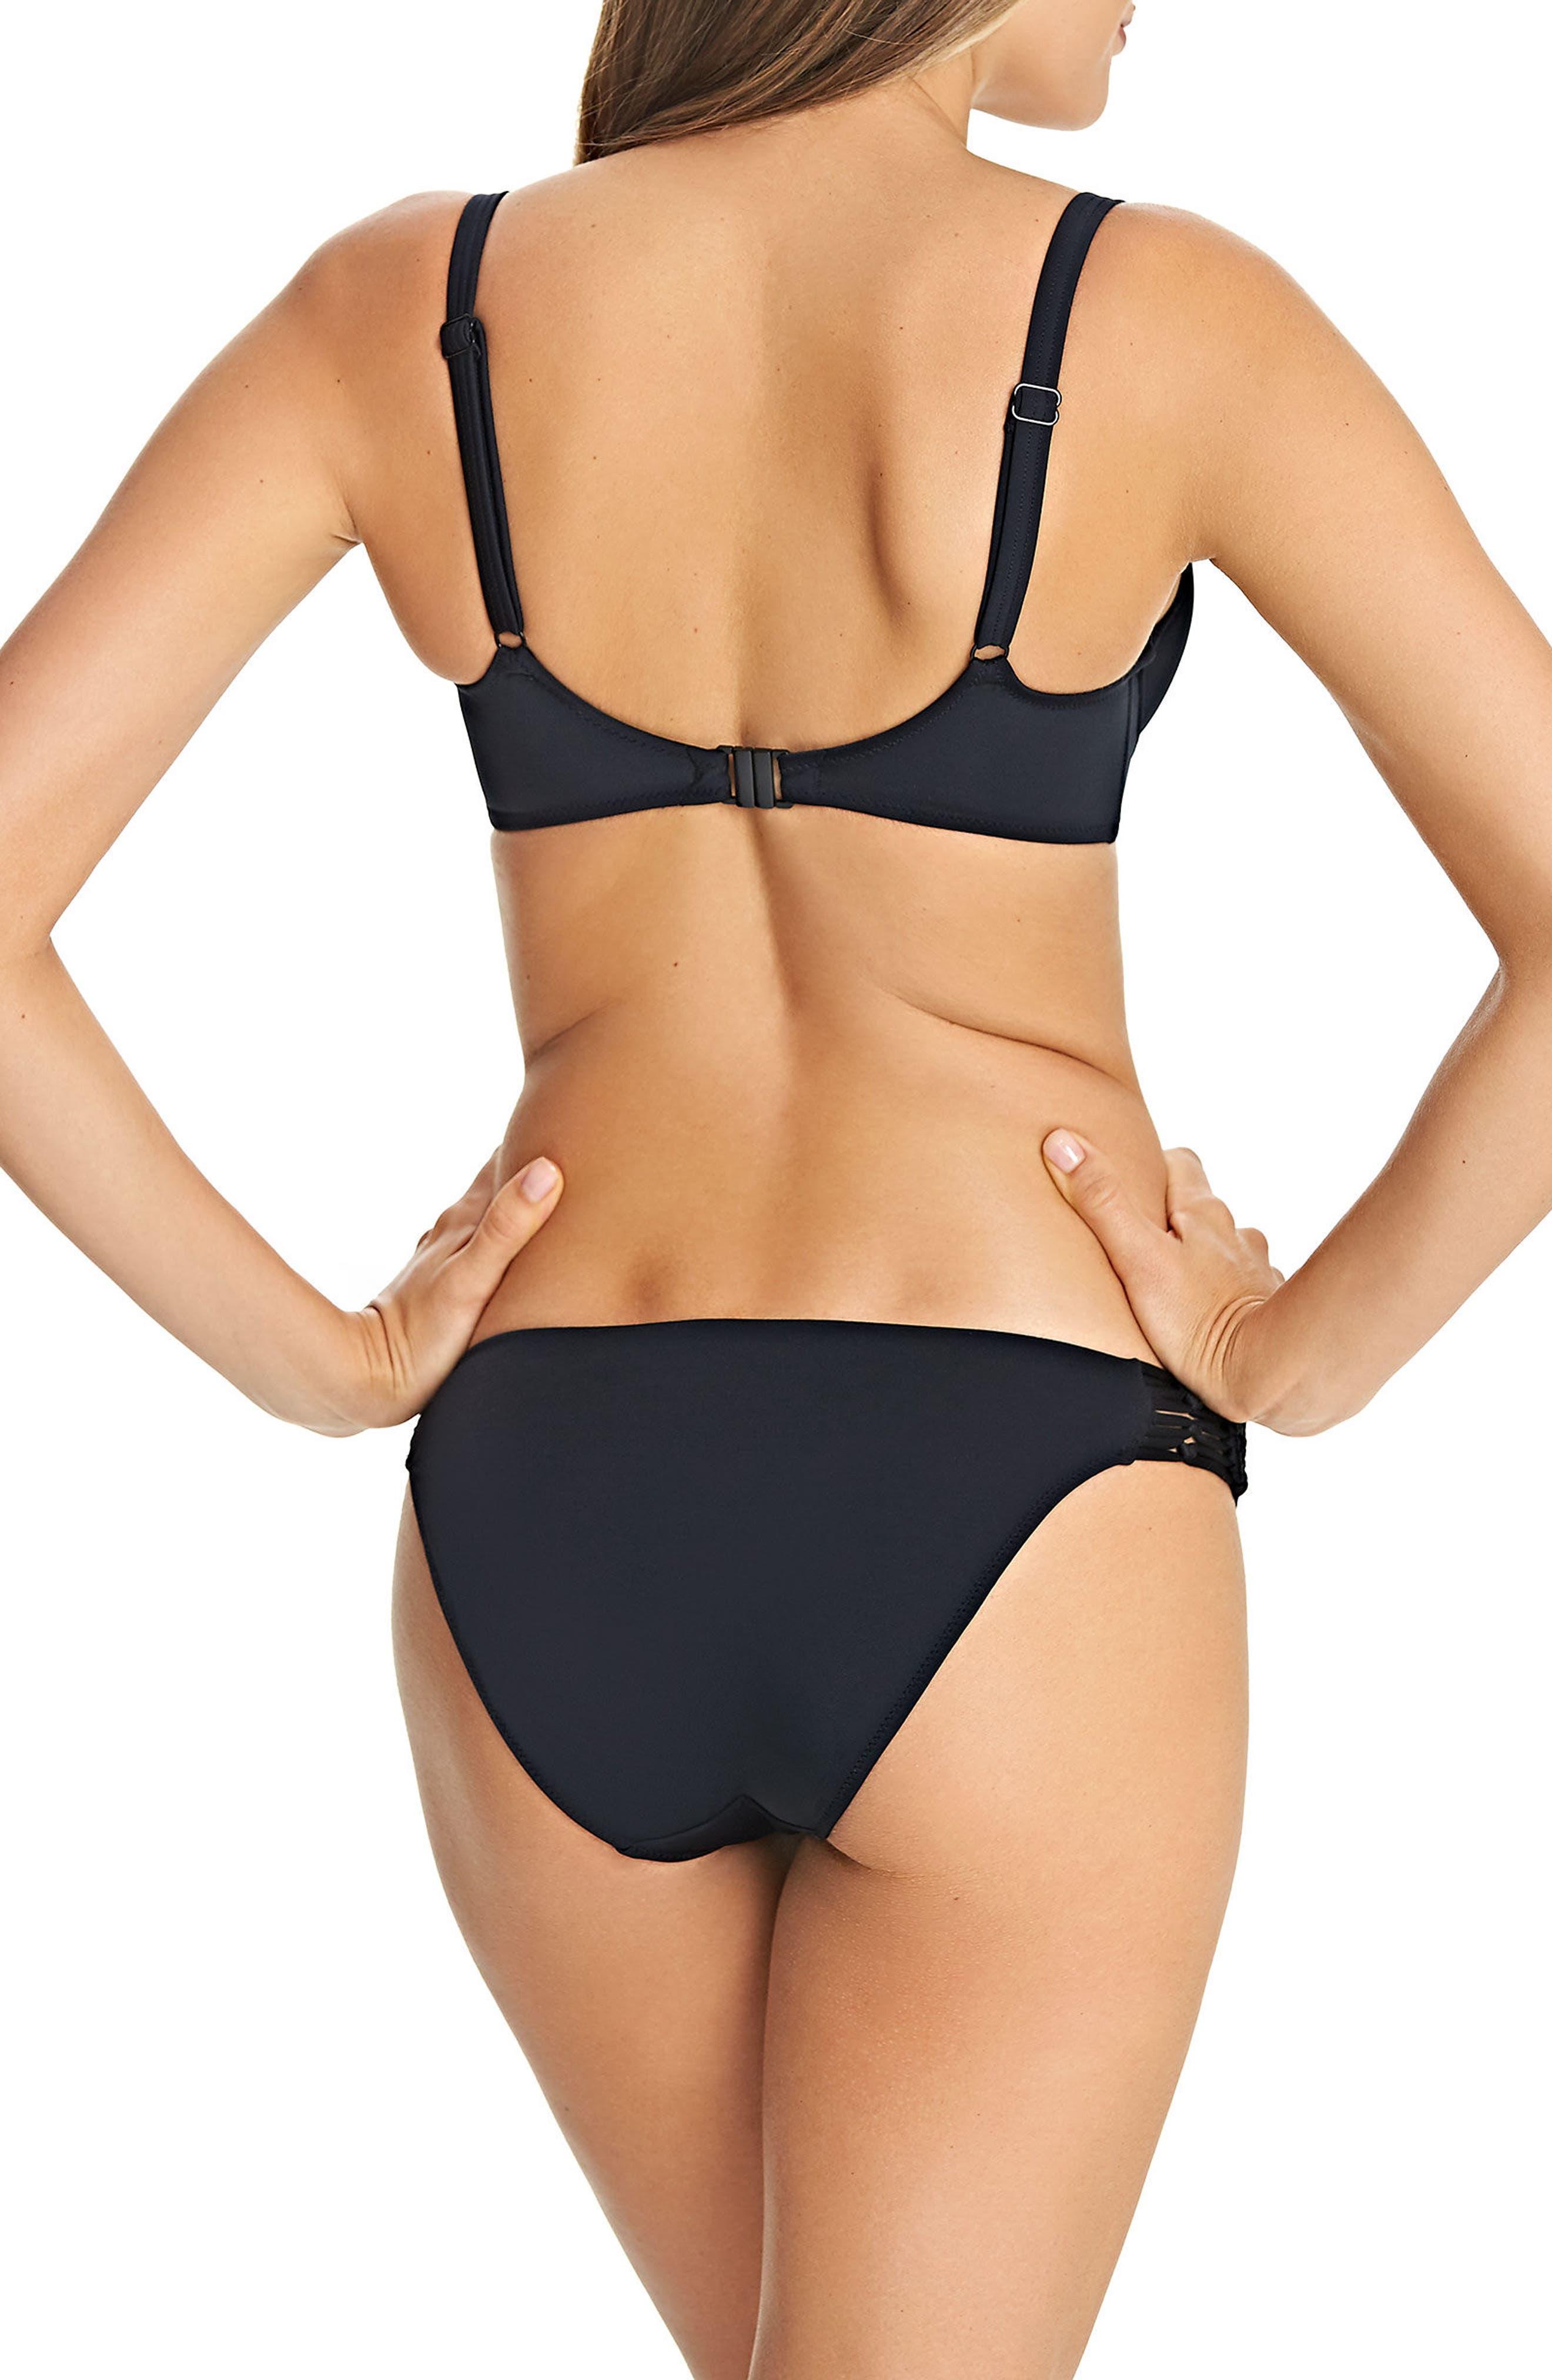 Underwire Macramé Bikini Top,                             Alternate thumbnail 4, color,                             001